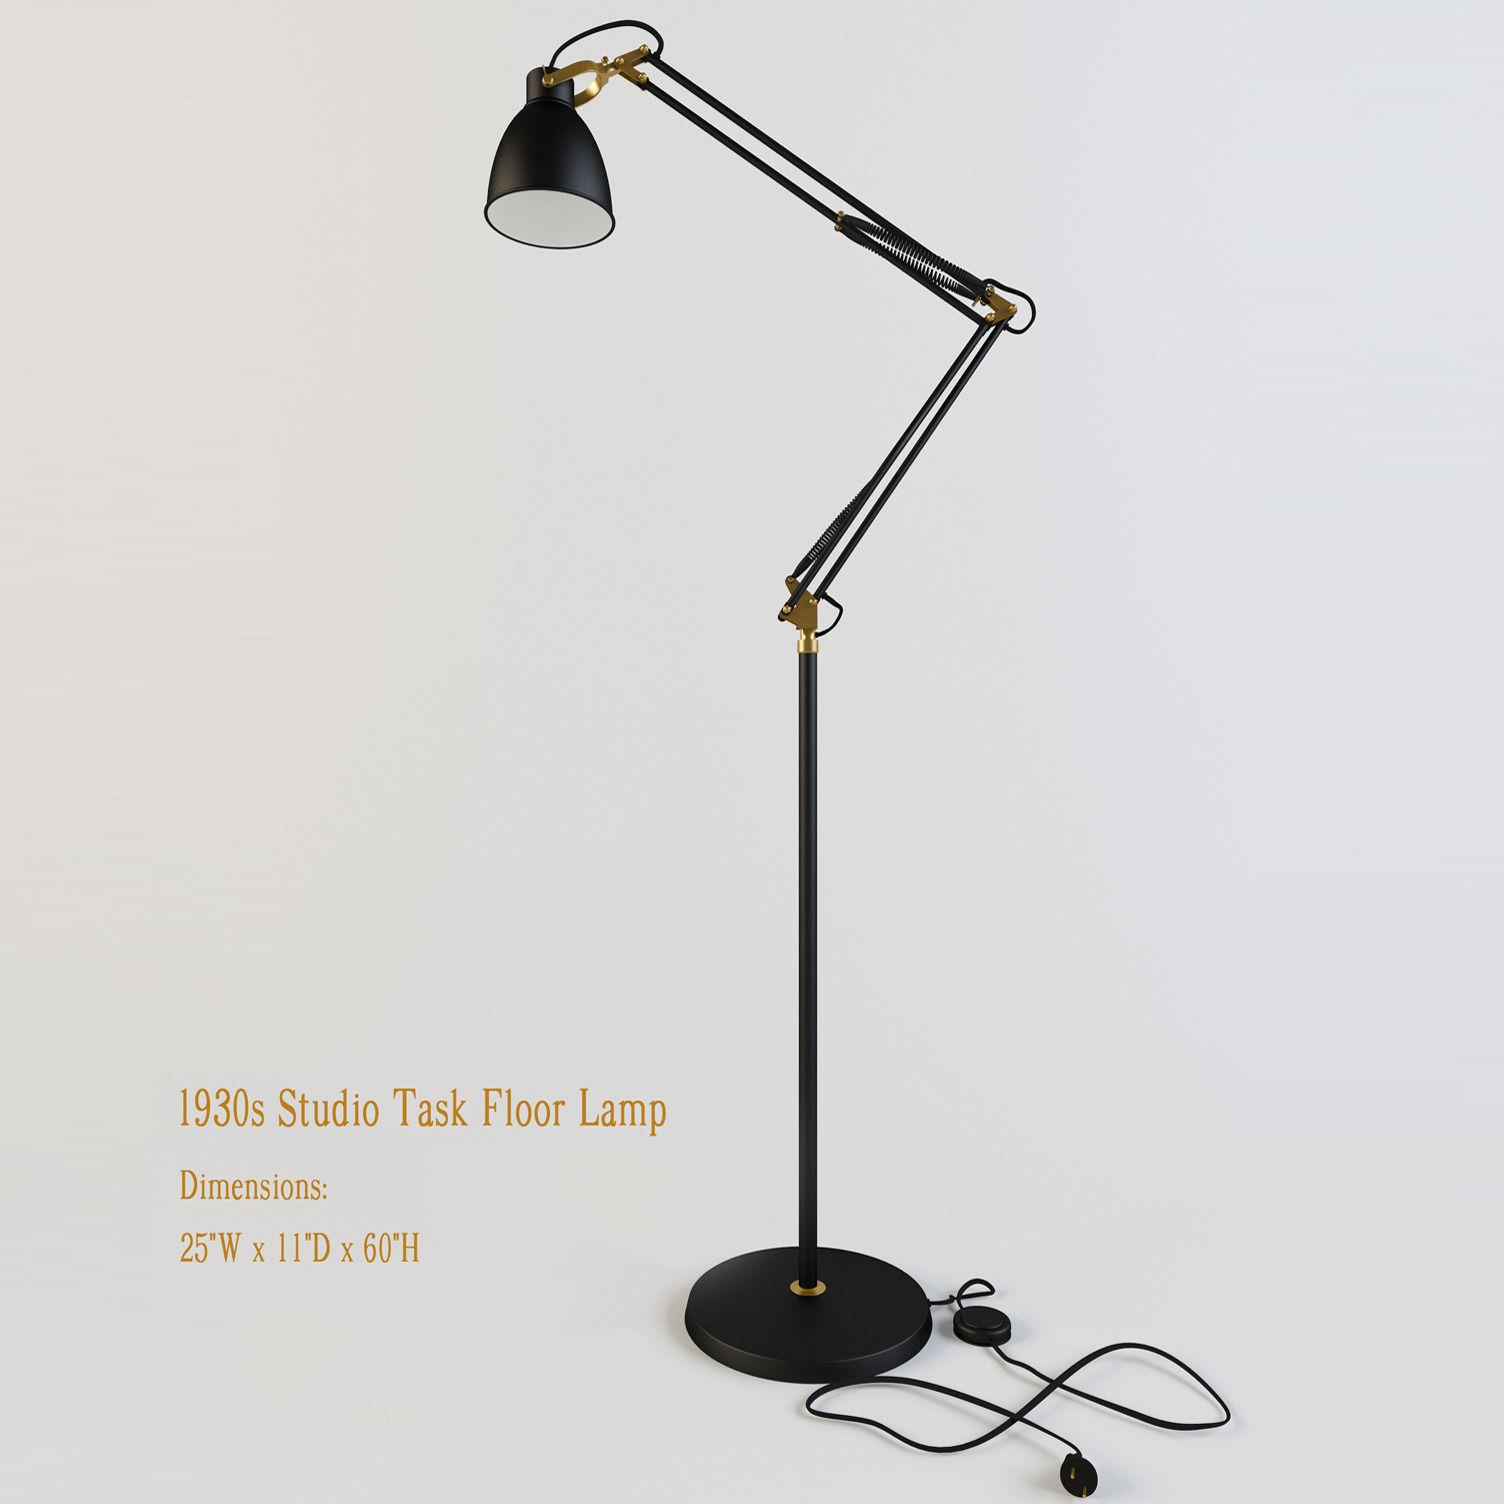 restoration hardware s studio task floor lamp d model max obj  - restoration hardware s studio task floor lamp d model max obj ds mtl